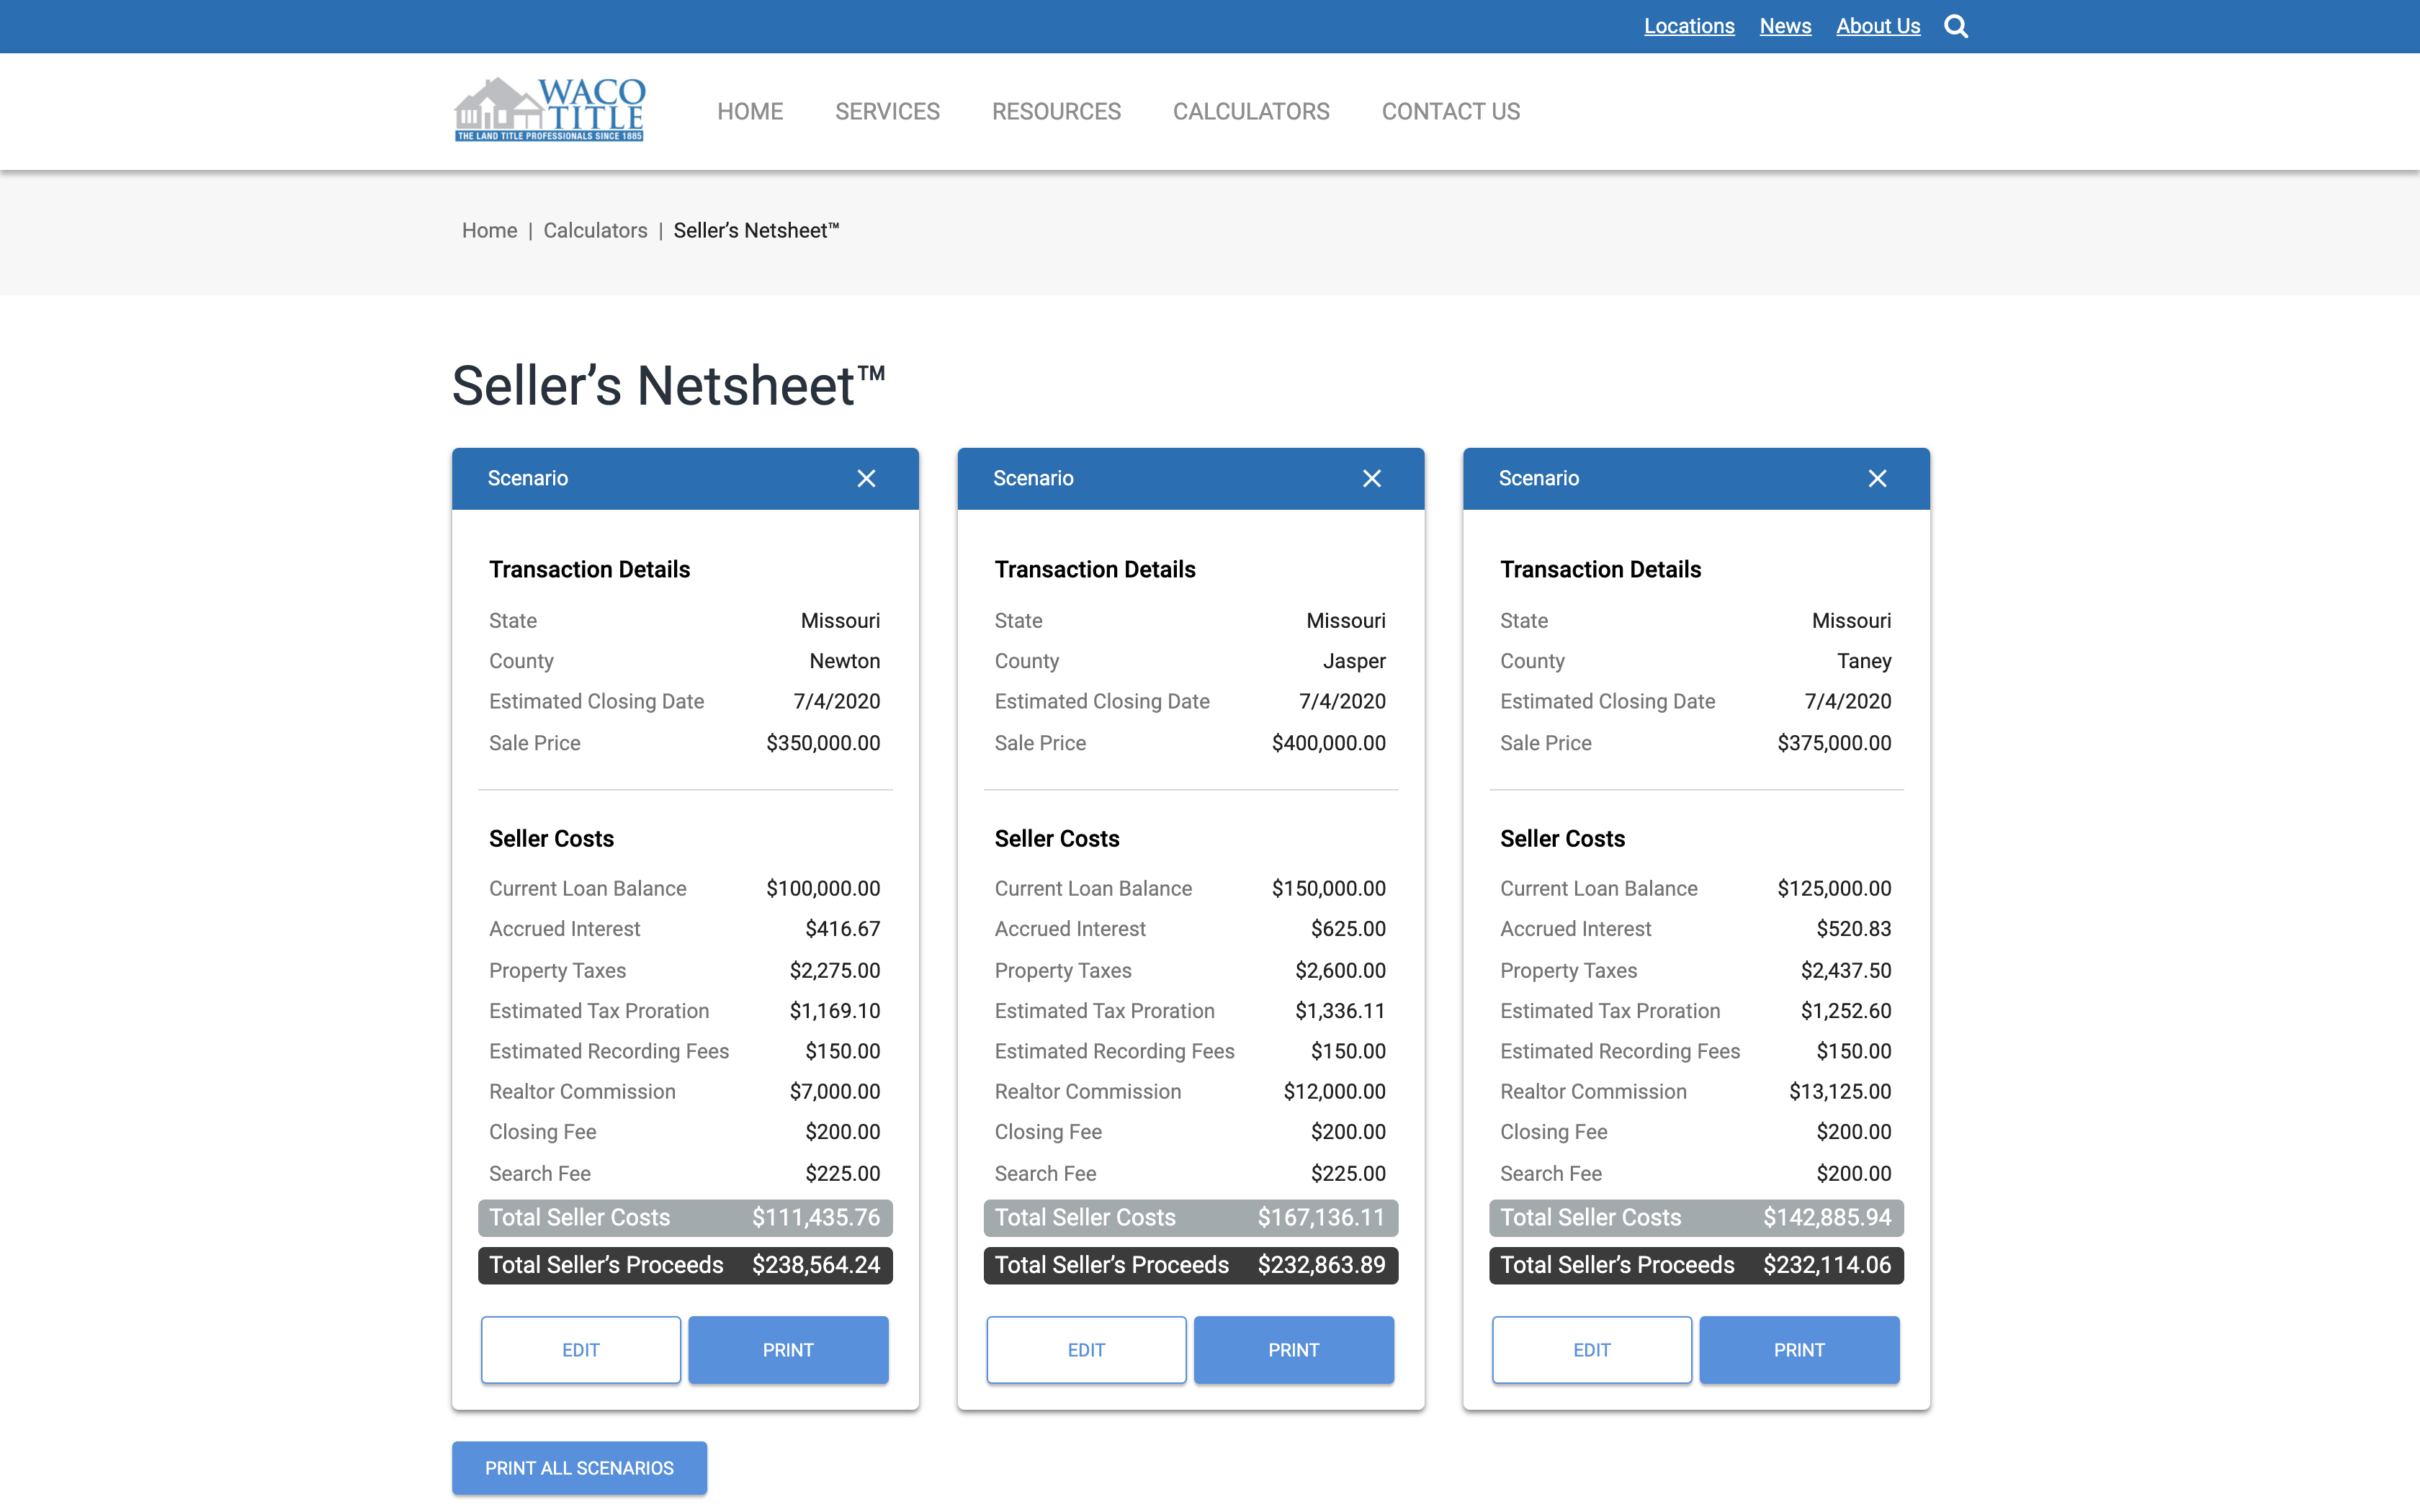 Seller's Netsheet Output - Comparison view